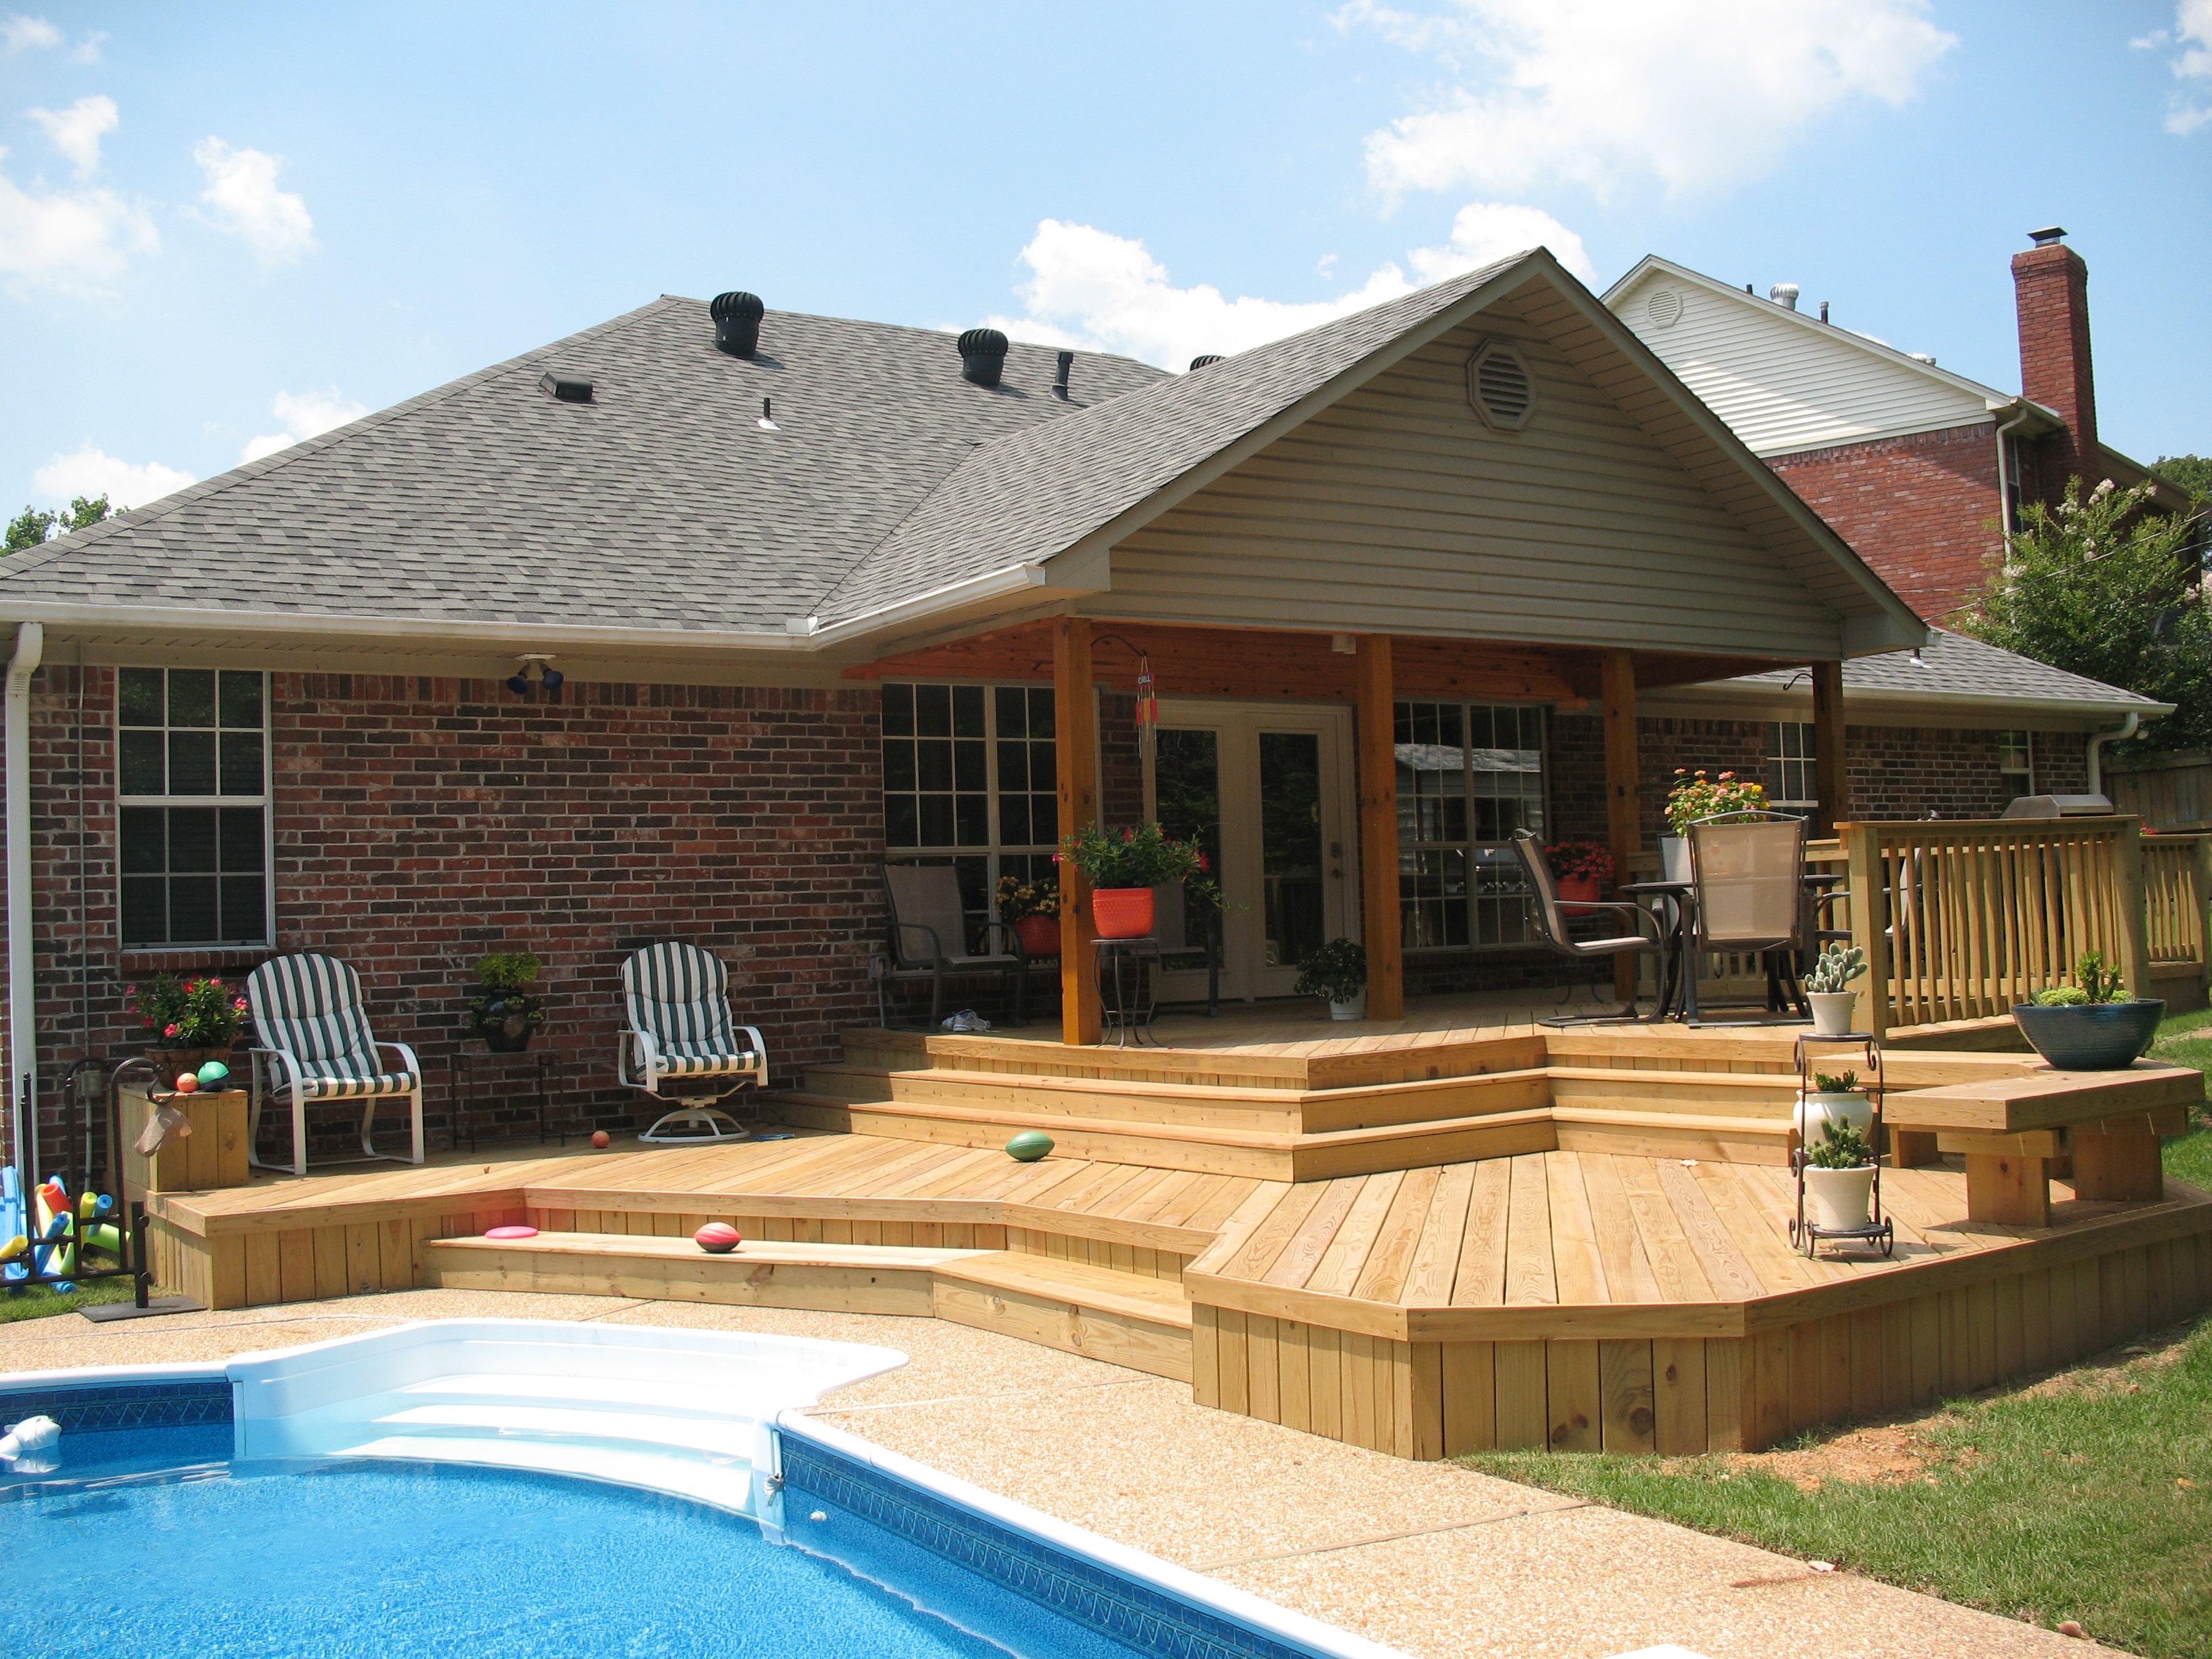 affordable decks St. Louis Mo | St. Louis decks, screened ... on Pool Deck Patio Ideas  id=62700